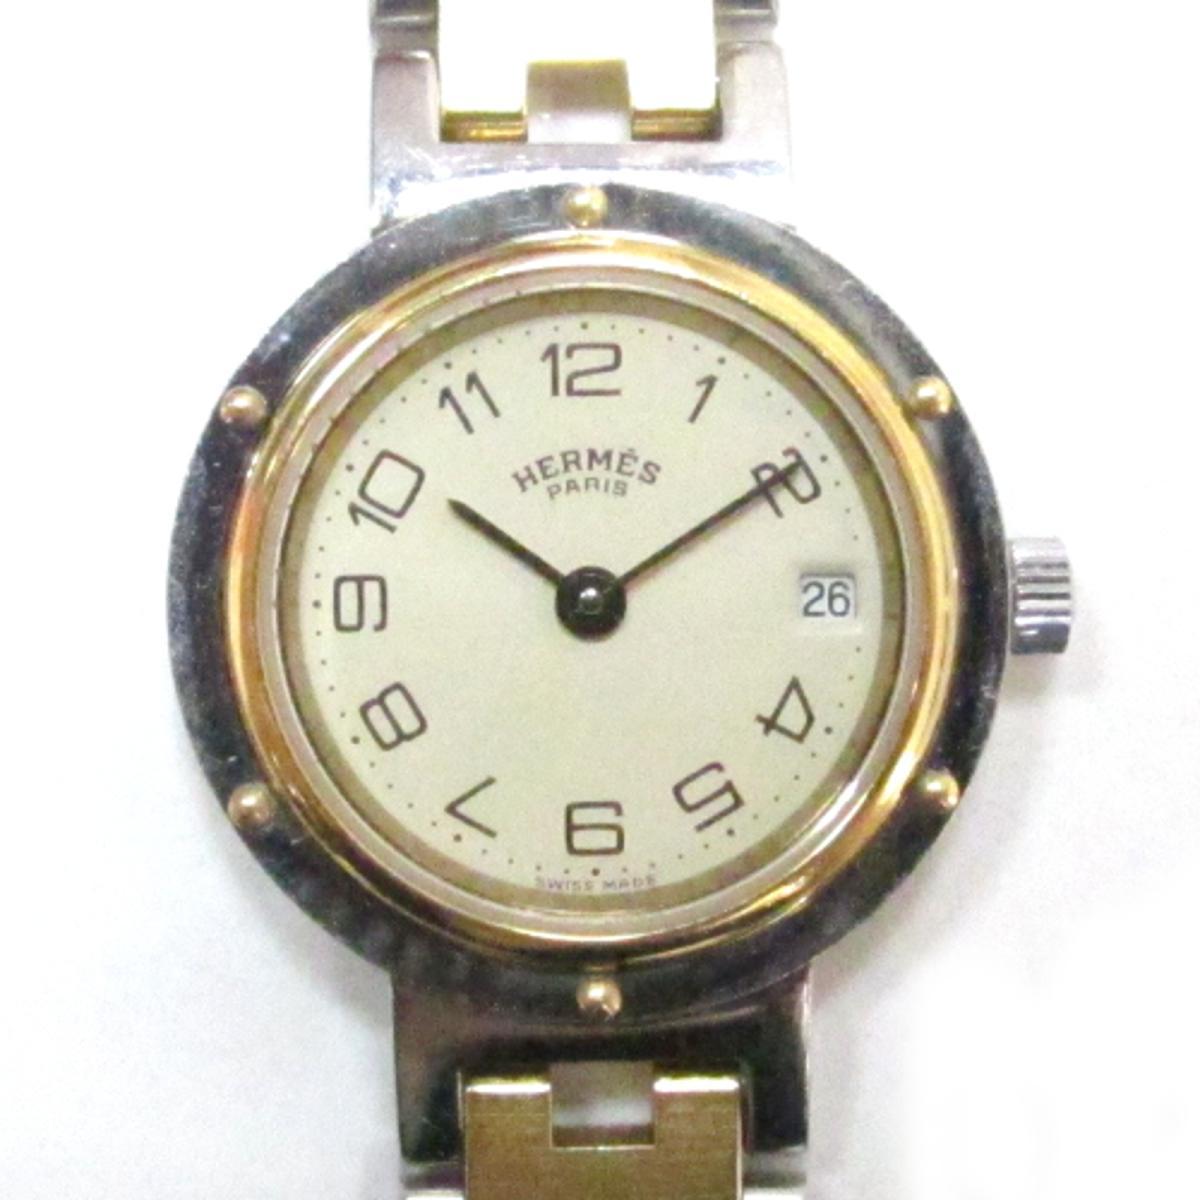 a2761703a1e8 ... 腕時計 時計 レディース ステンレススチール (SS) ゴールド × シルバー ベージュ | HERMES BRANDOFF ブランドオフ  ブランド ブランド時計 ブランド腕時計